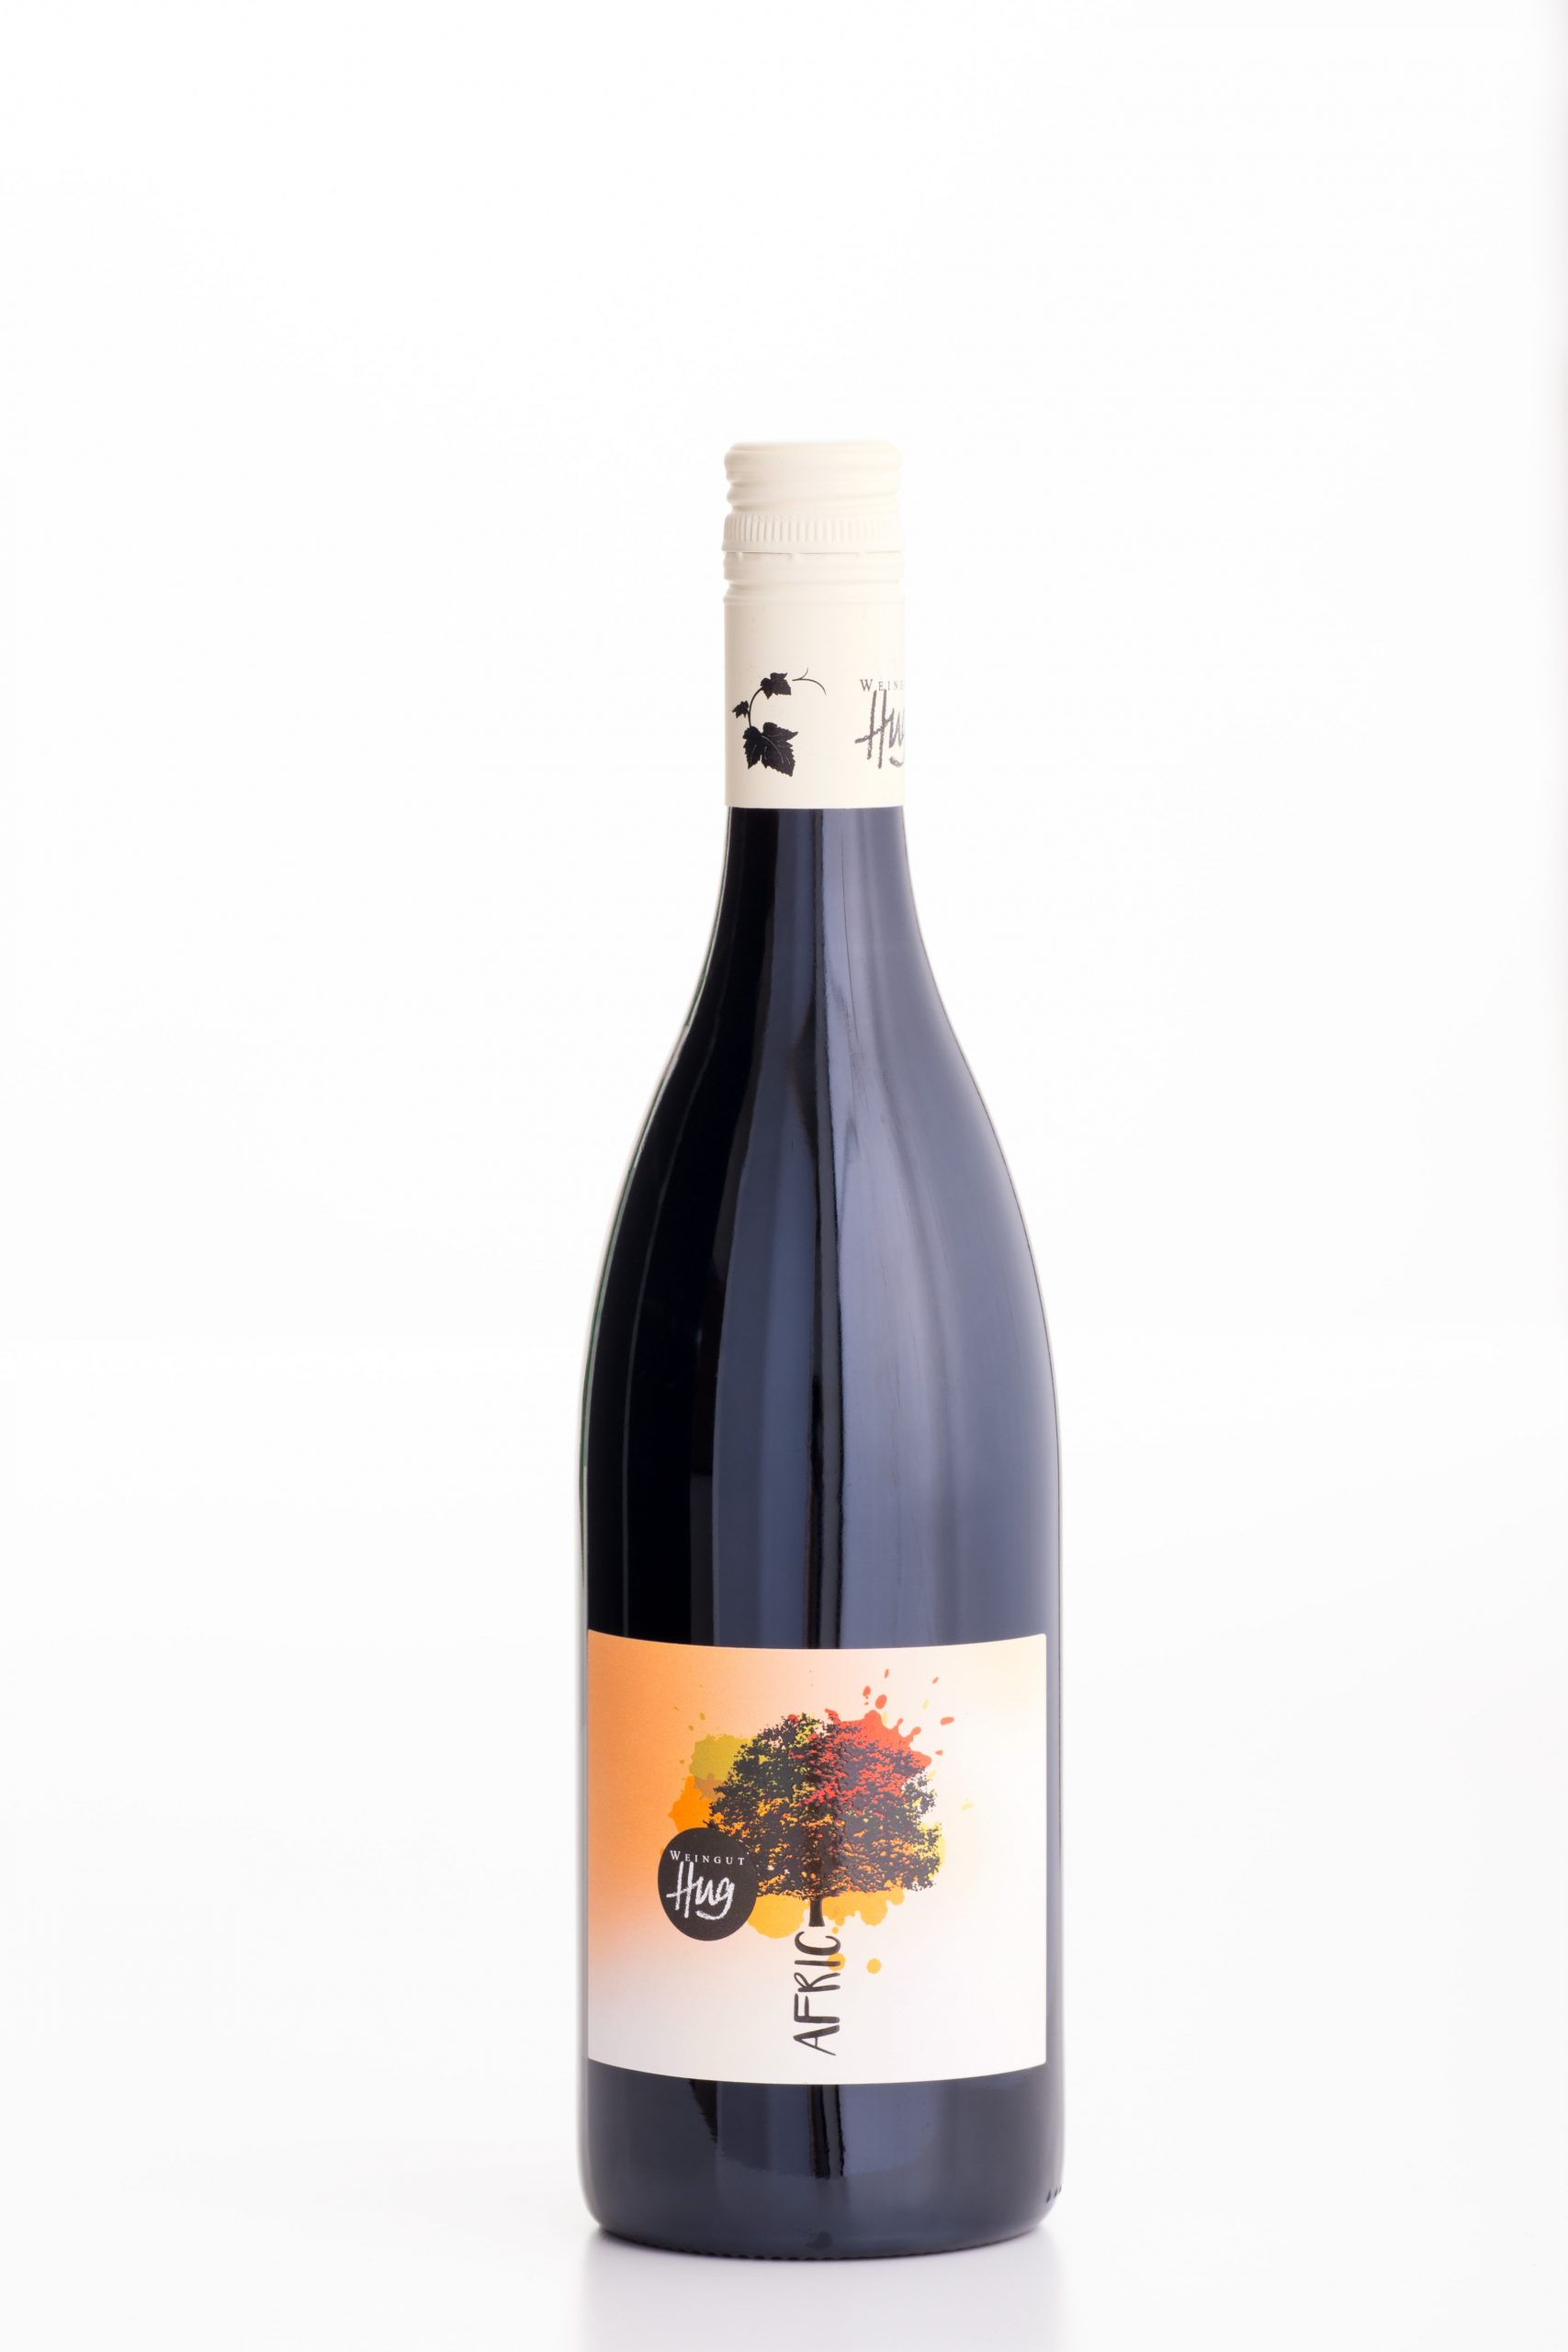 Afrik-Rotwein   Weingut Hug in Pfaffenweiler bei Freiburg im Breisgau